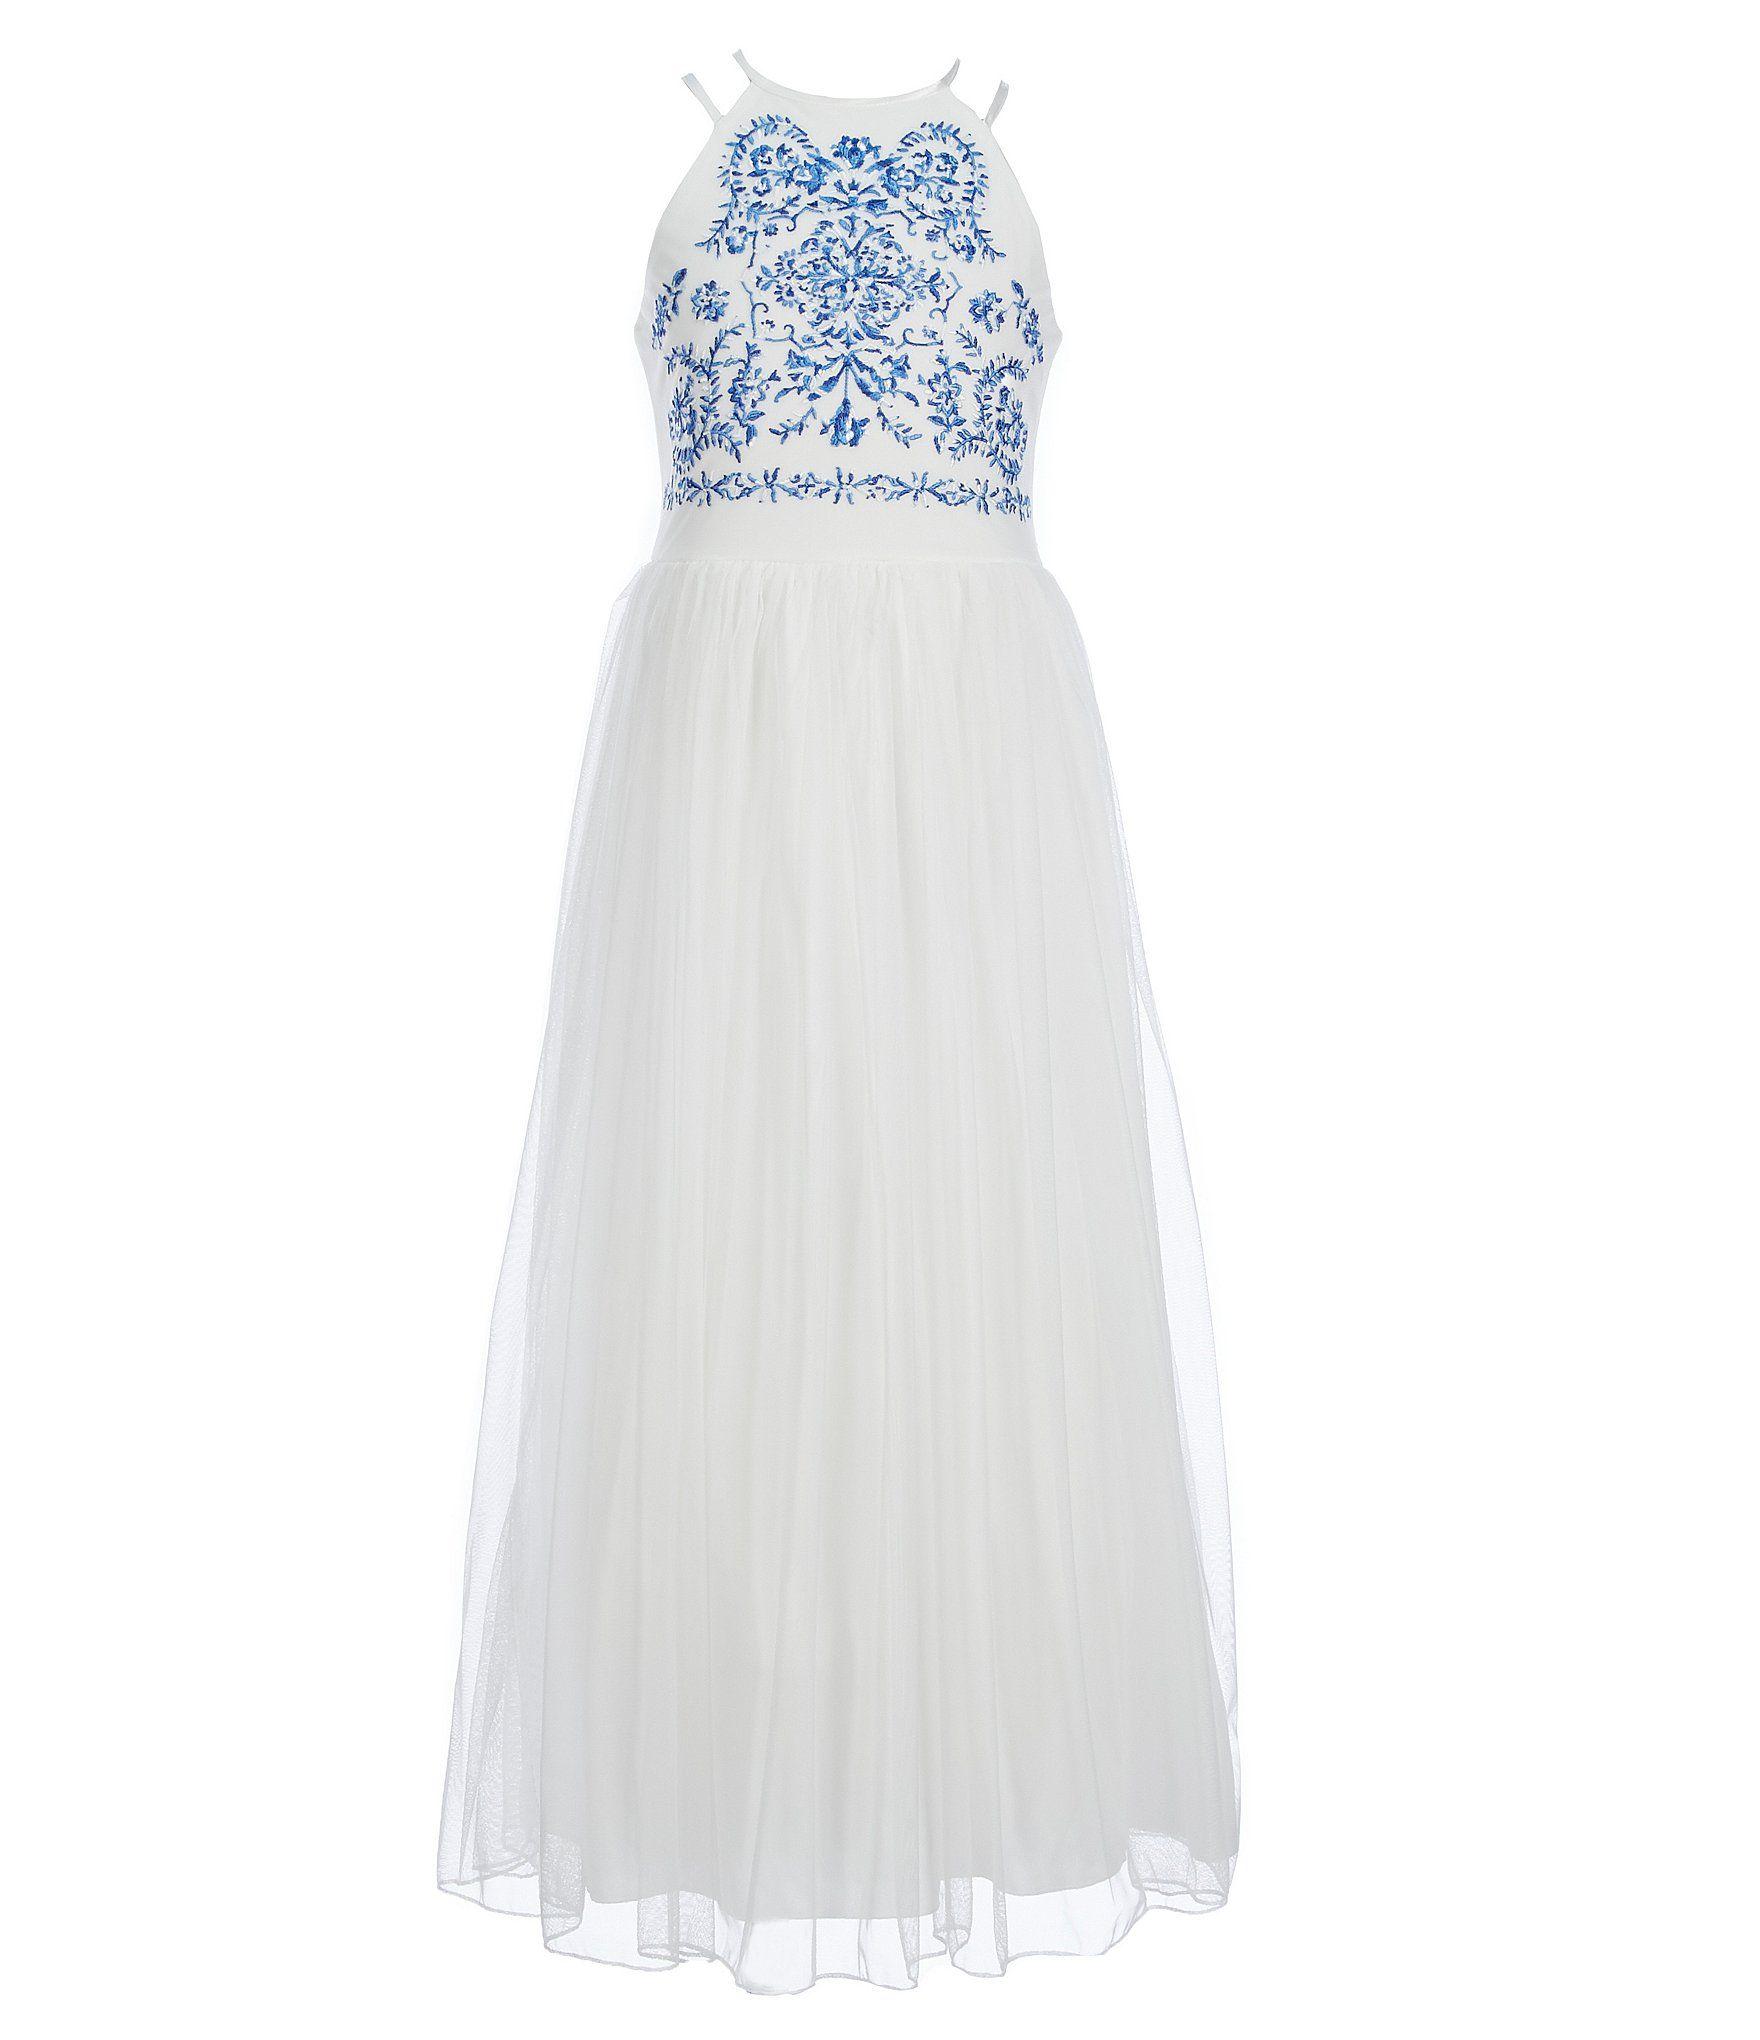 657cee5a00ab Xtraordinary Big Girls 716 DoubleStrap Embroidered Bodice Long Dress  #Dillards